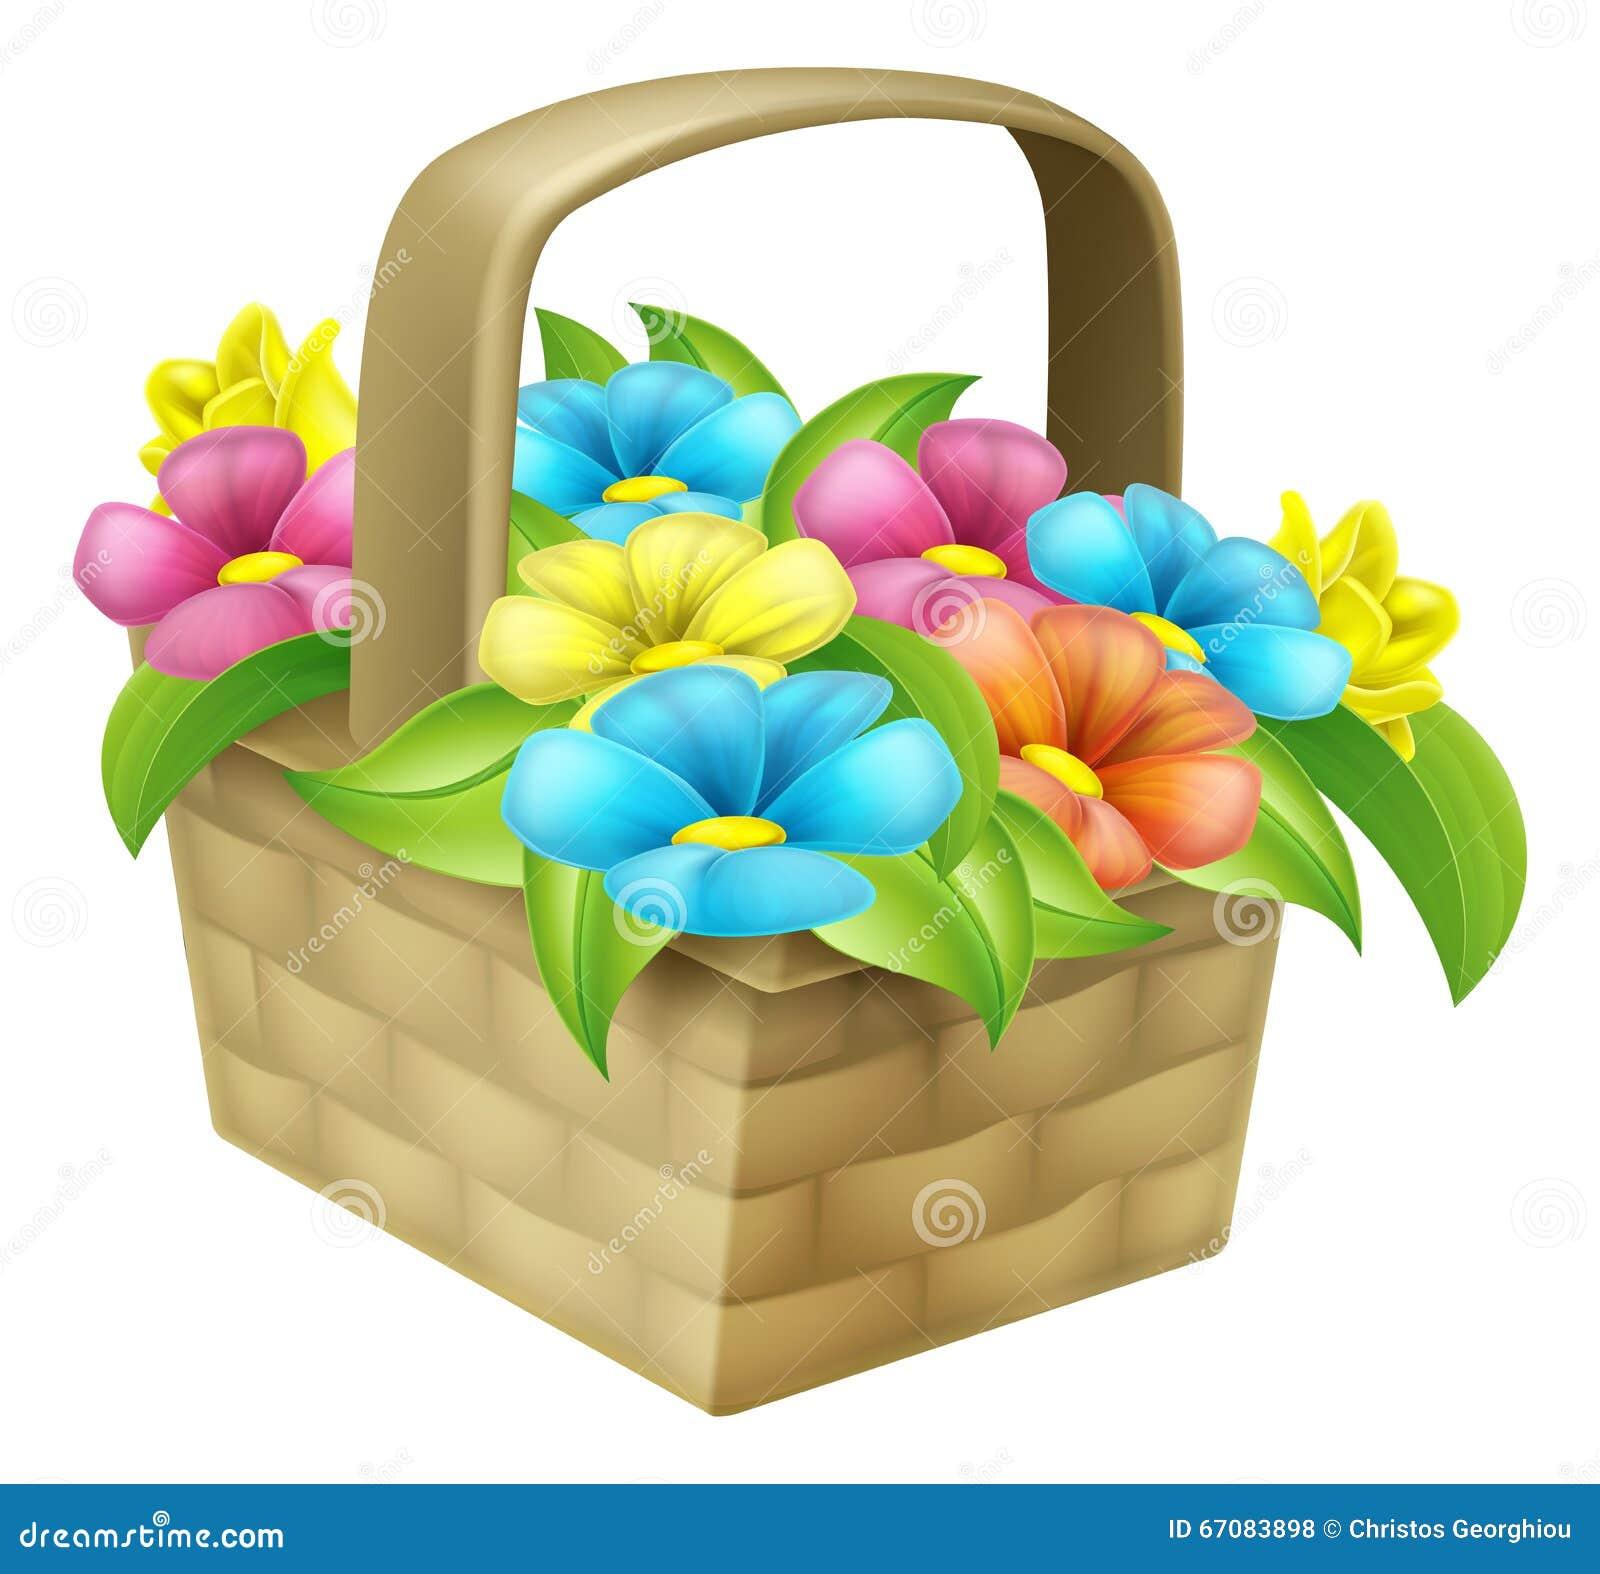 Cartoon floral basket stock vector illustration of greeting 67083898 cartoon floral basket izmirmasajfo